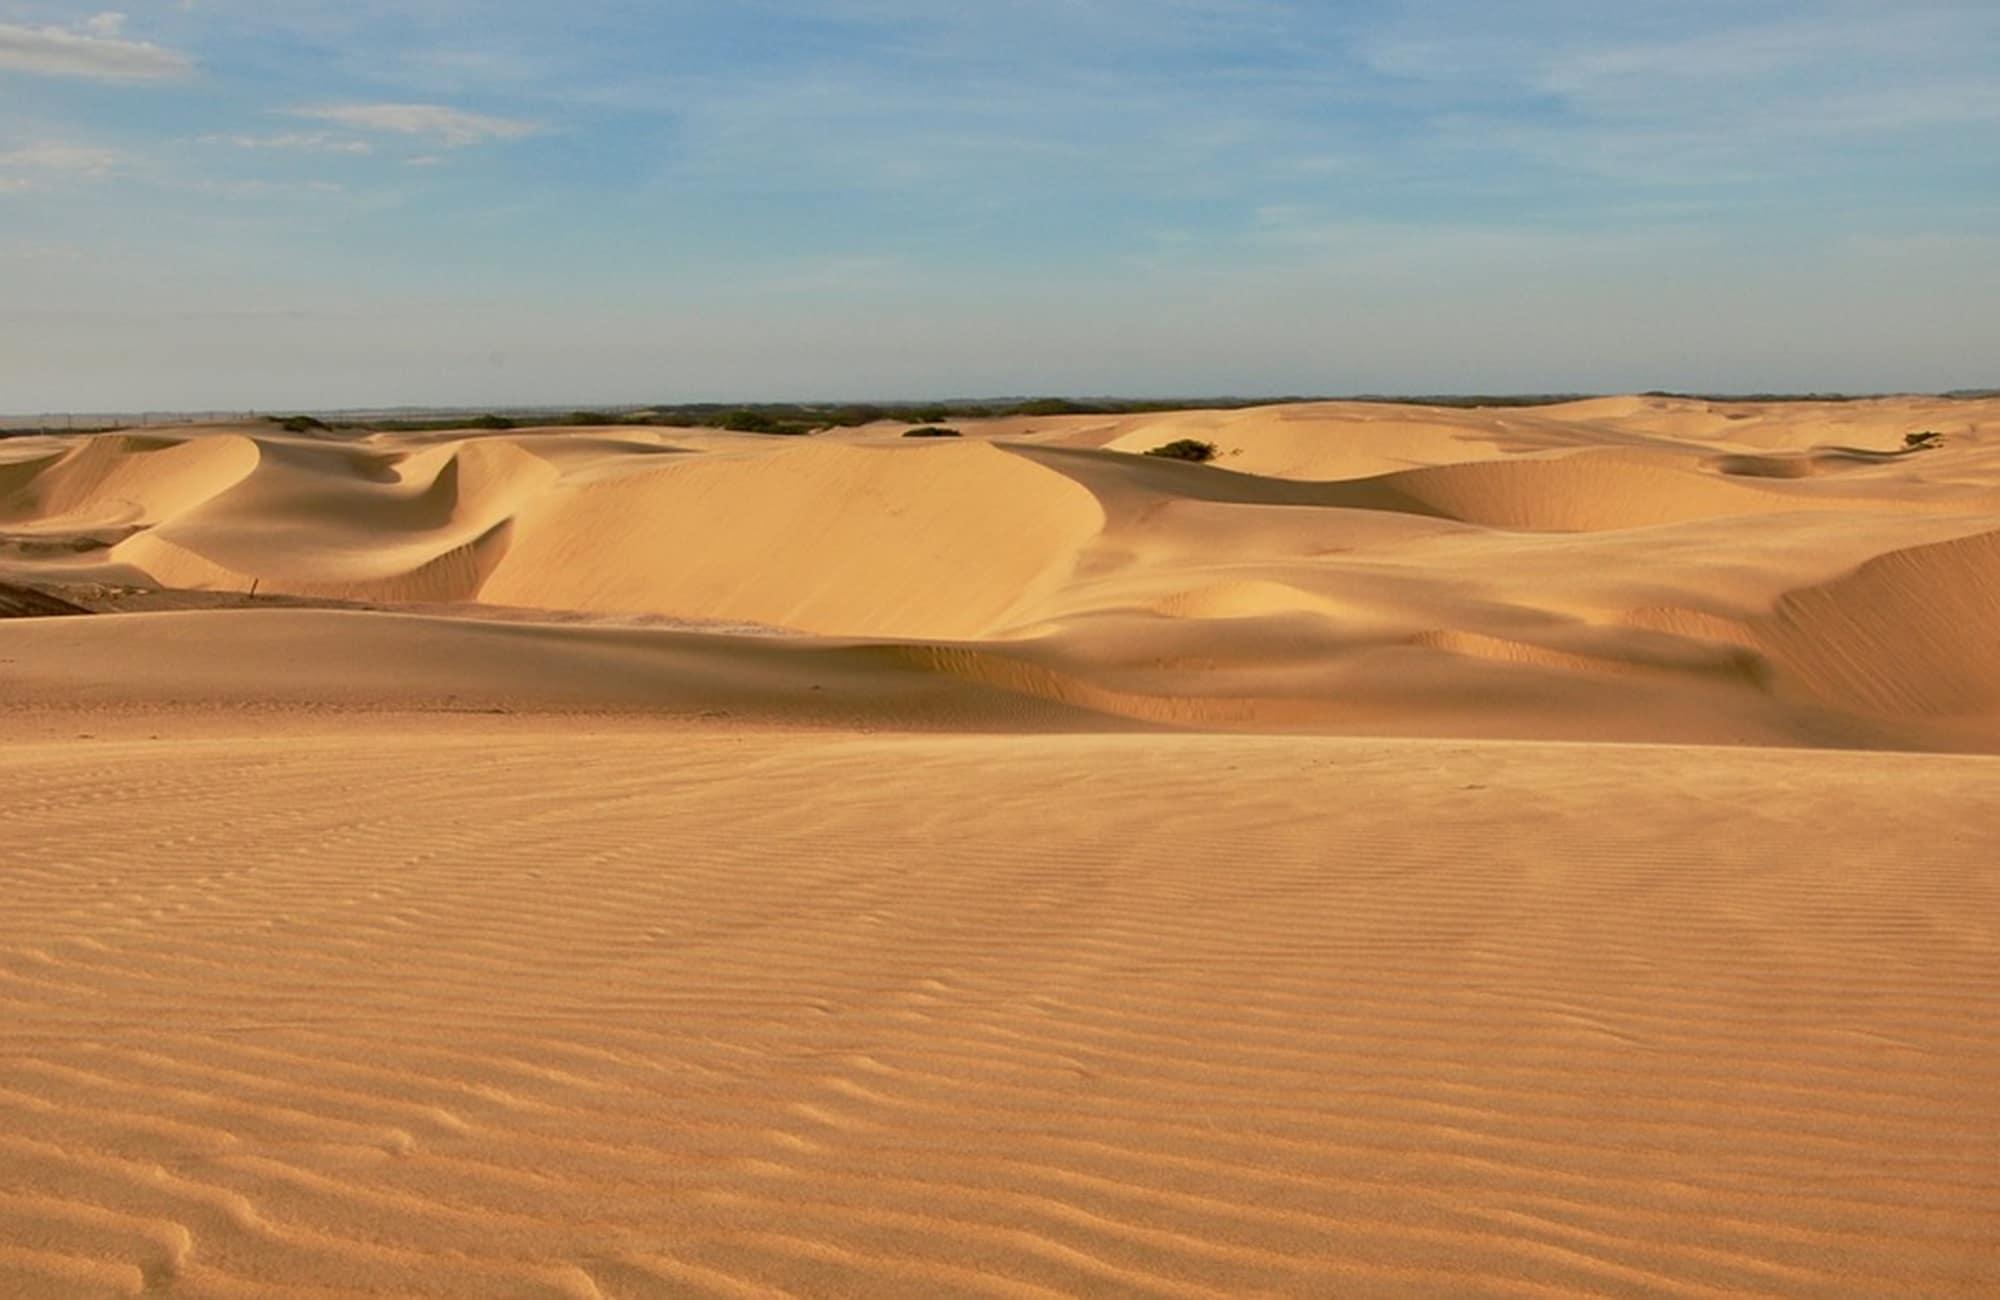 Voyage en Argentine - Medanos - Amplitudes